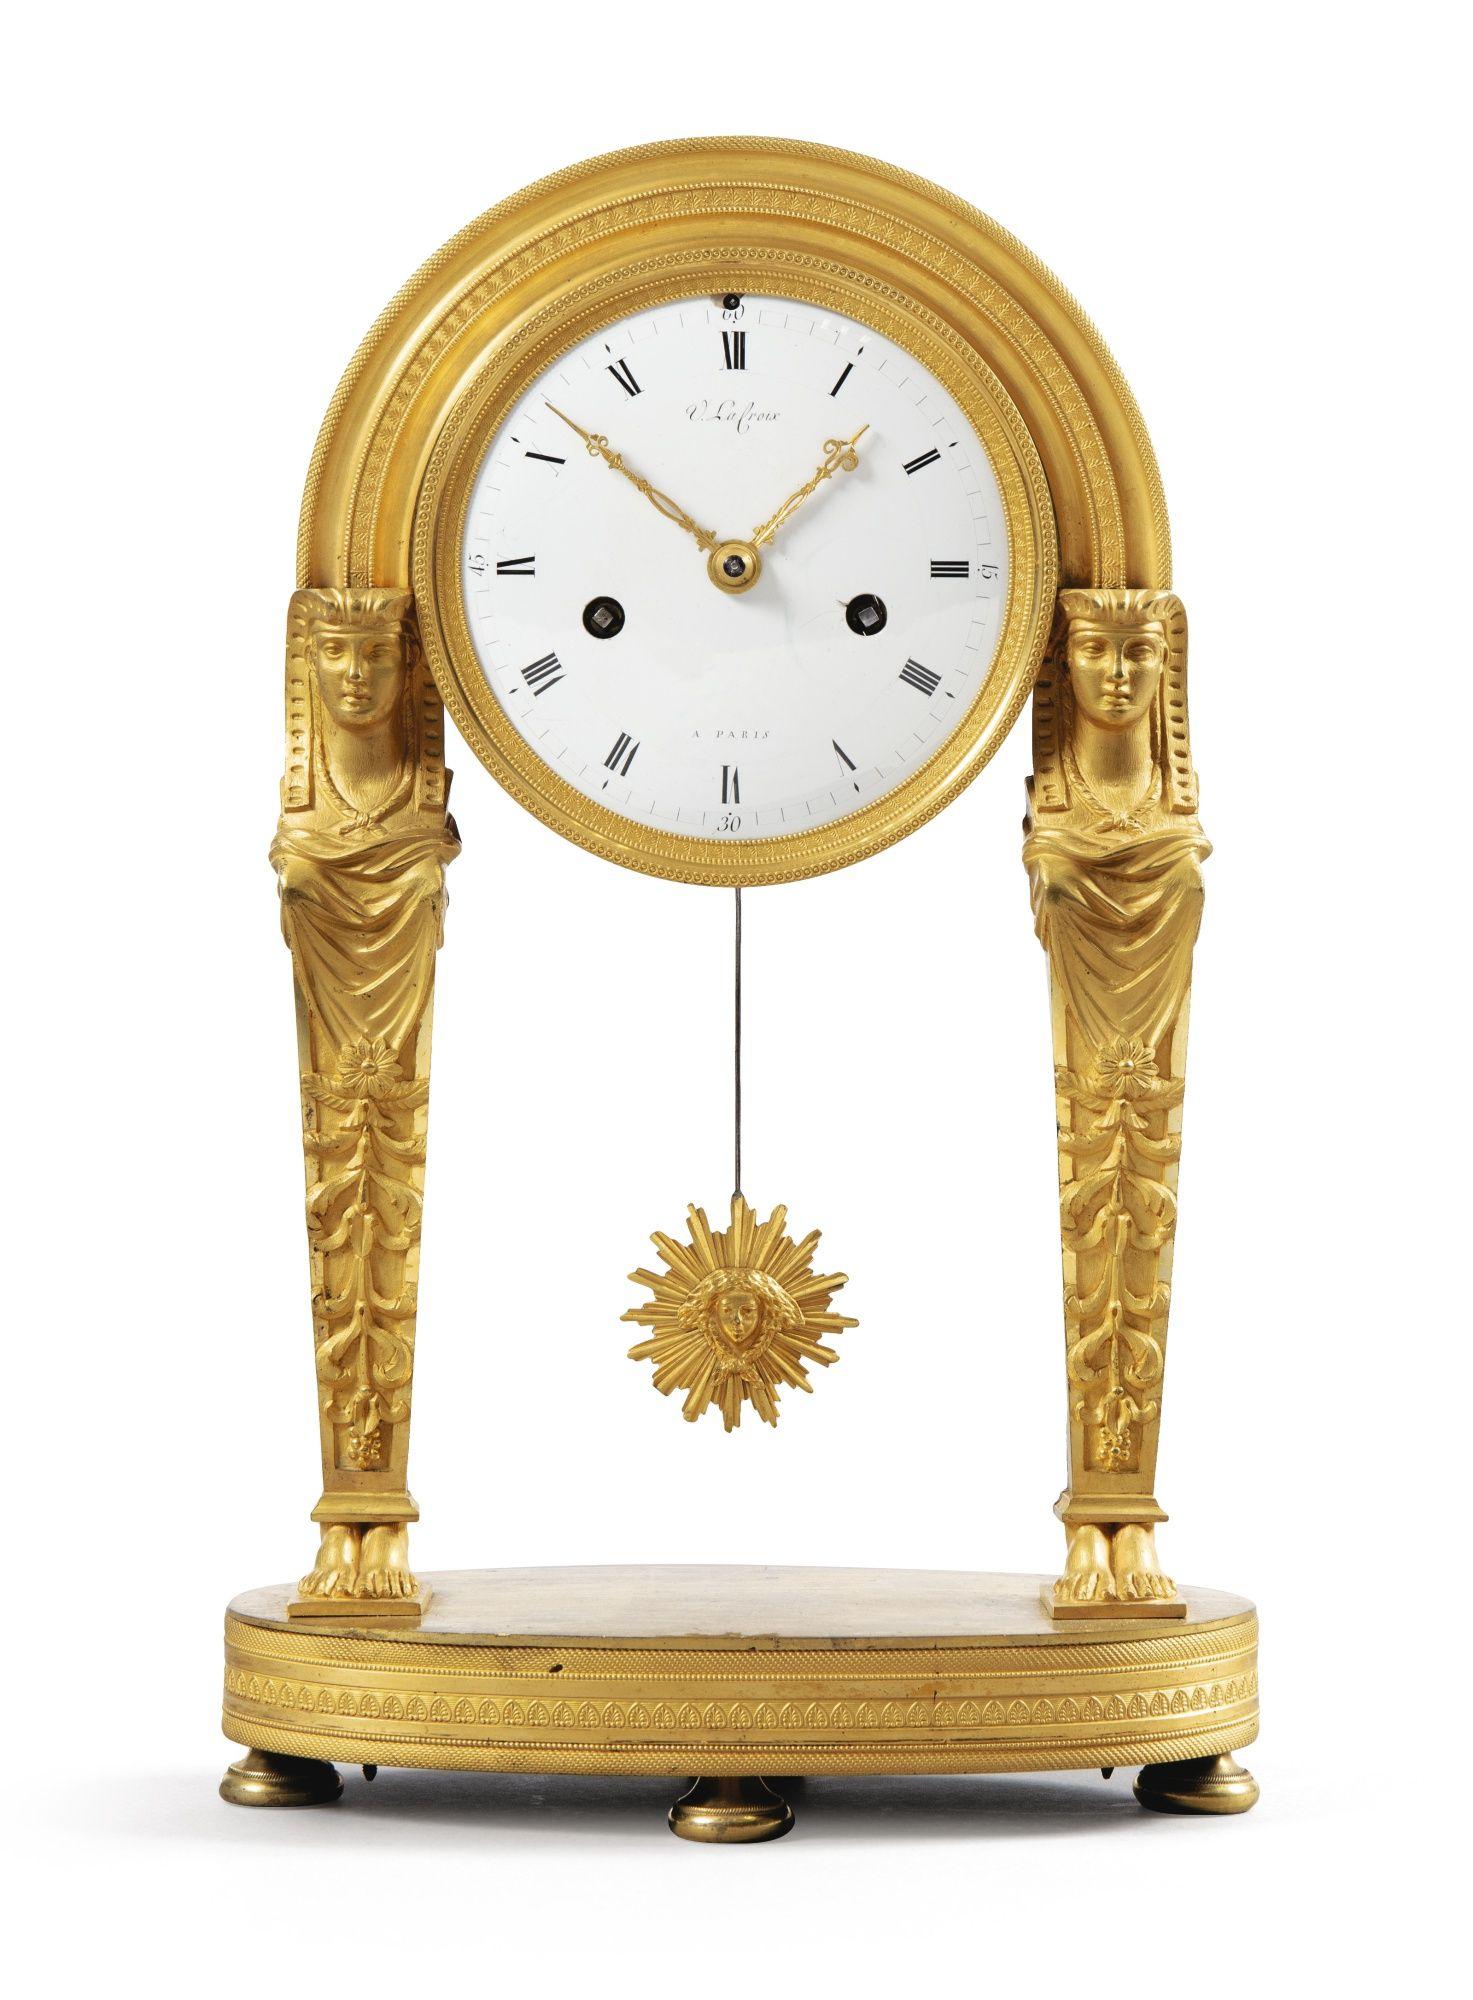 Date Unspecified A French Empire Gilt Bronze Mantel Clock Estimate 800 1 200 Eur Lot So Antique Pendulum Wall Clock Vintage Clock Classic Clocks